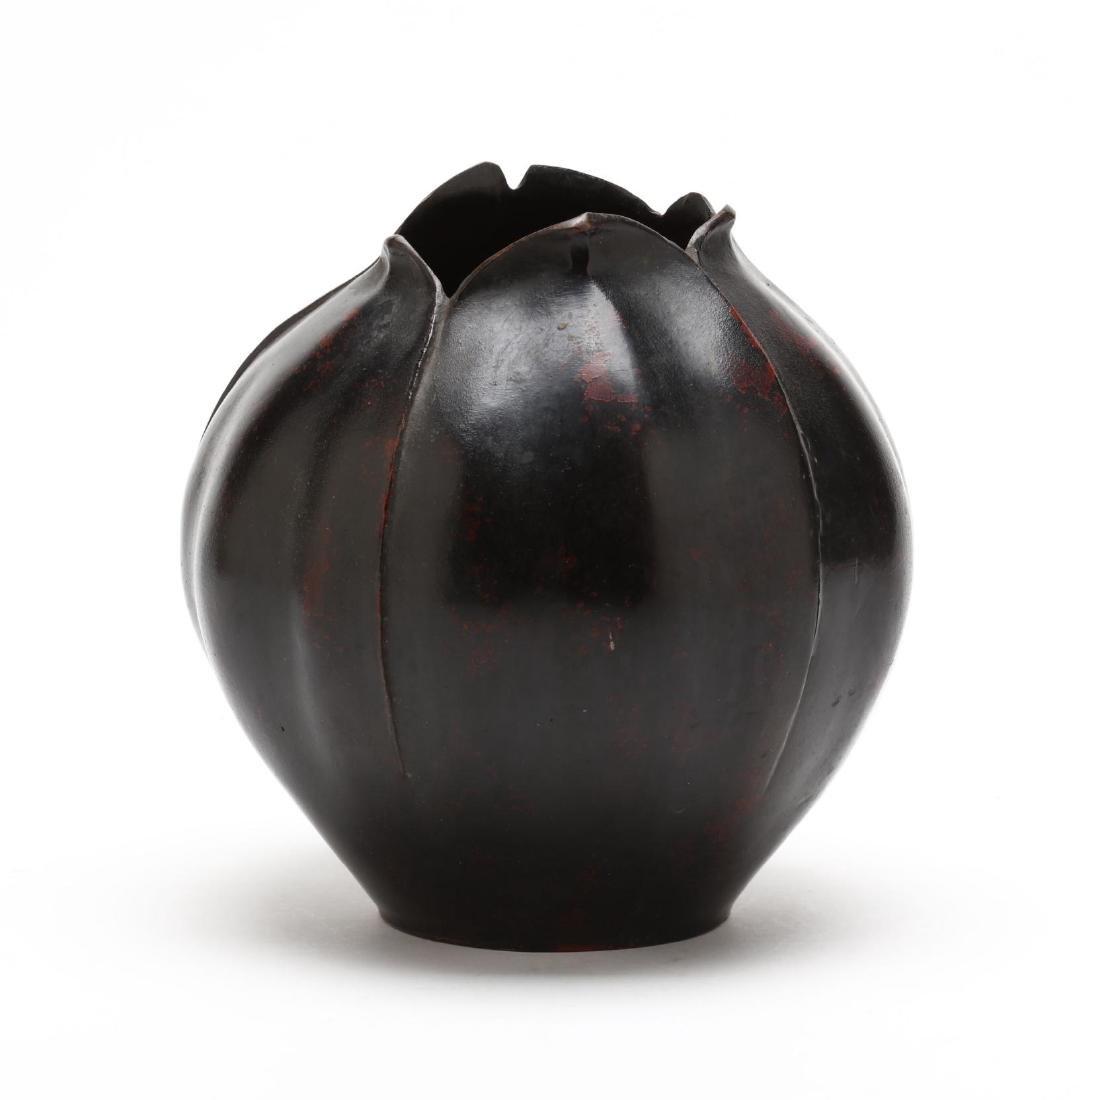 Japanese Tulip Vase